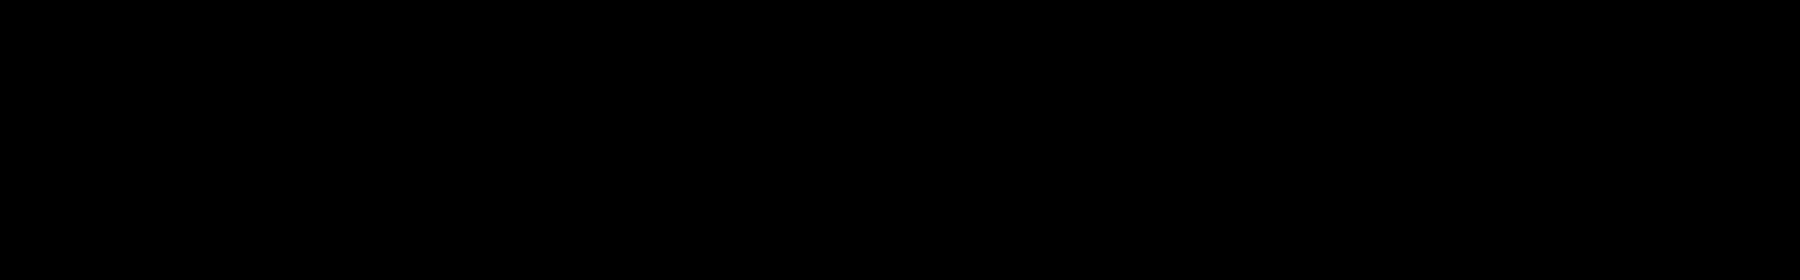 Marshmellows audio waveform